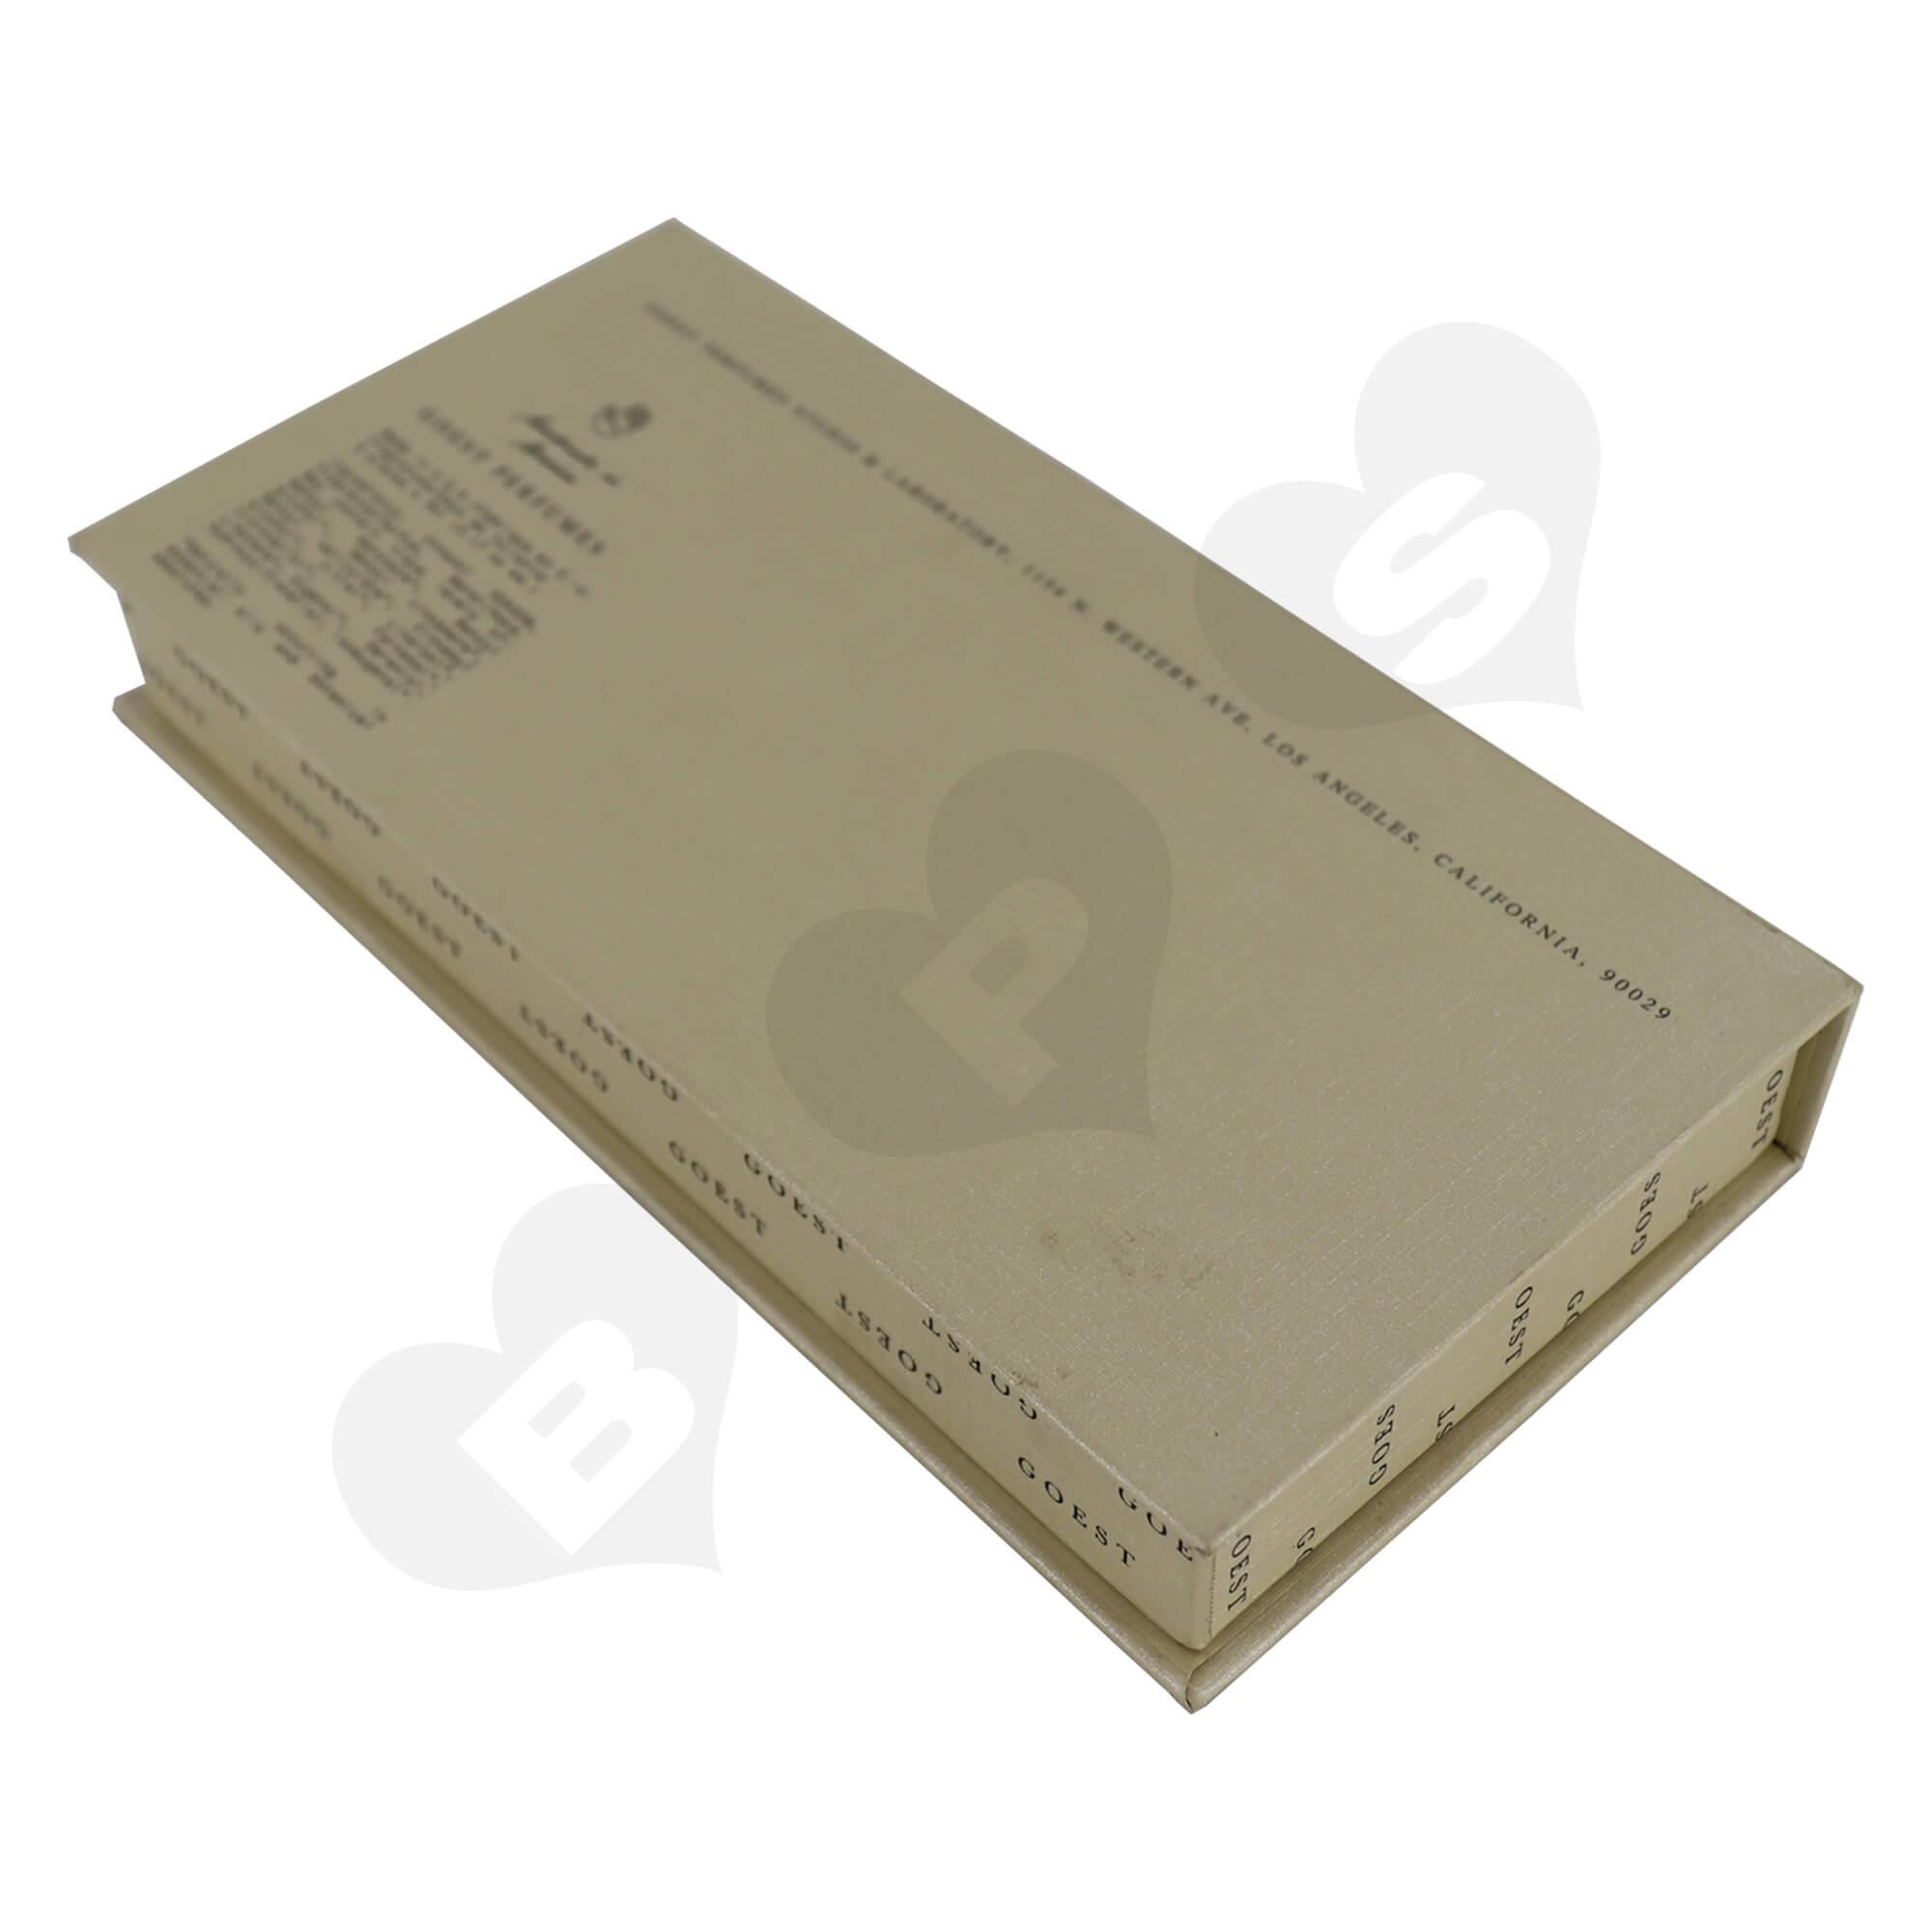 Custom Hinged Lid Book Shape Box For Packing Perfume Trial Kit Side View Three